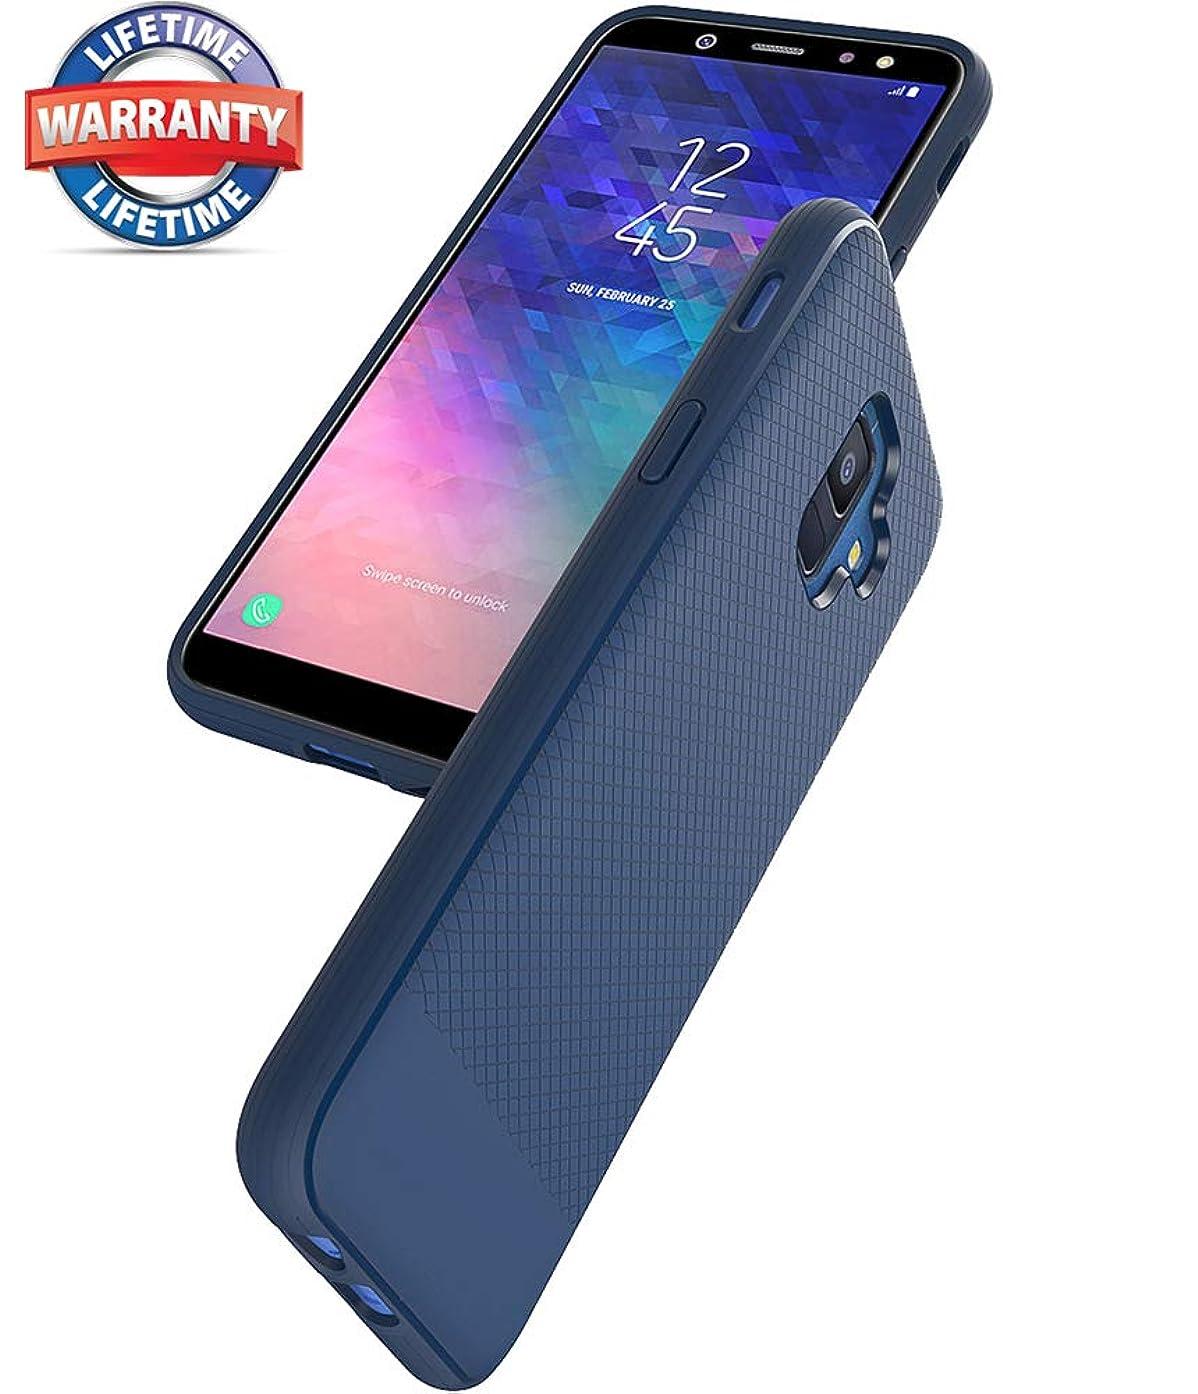 Galaxy A6 Case, Samsung Galaxy A6 Case, Asmart Resilient Shock Absorption Galaxy A6 Phone Case Slim TPU Bumper Cover Flexible Protective Phone Case for Samsung Galaxy A6 2018 (Blue)